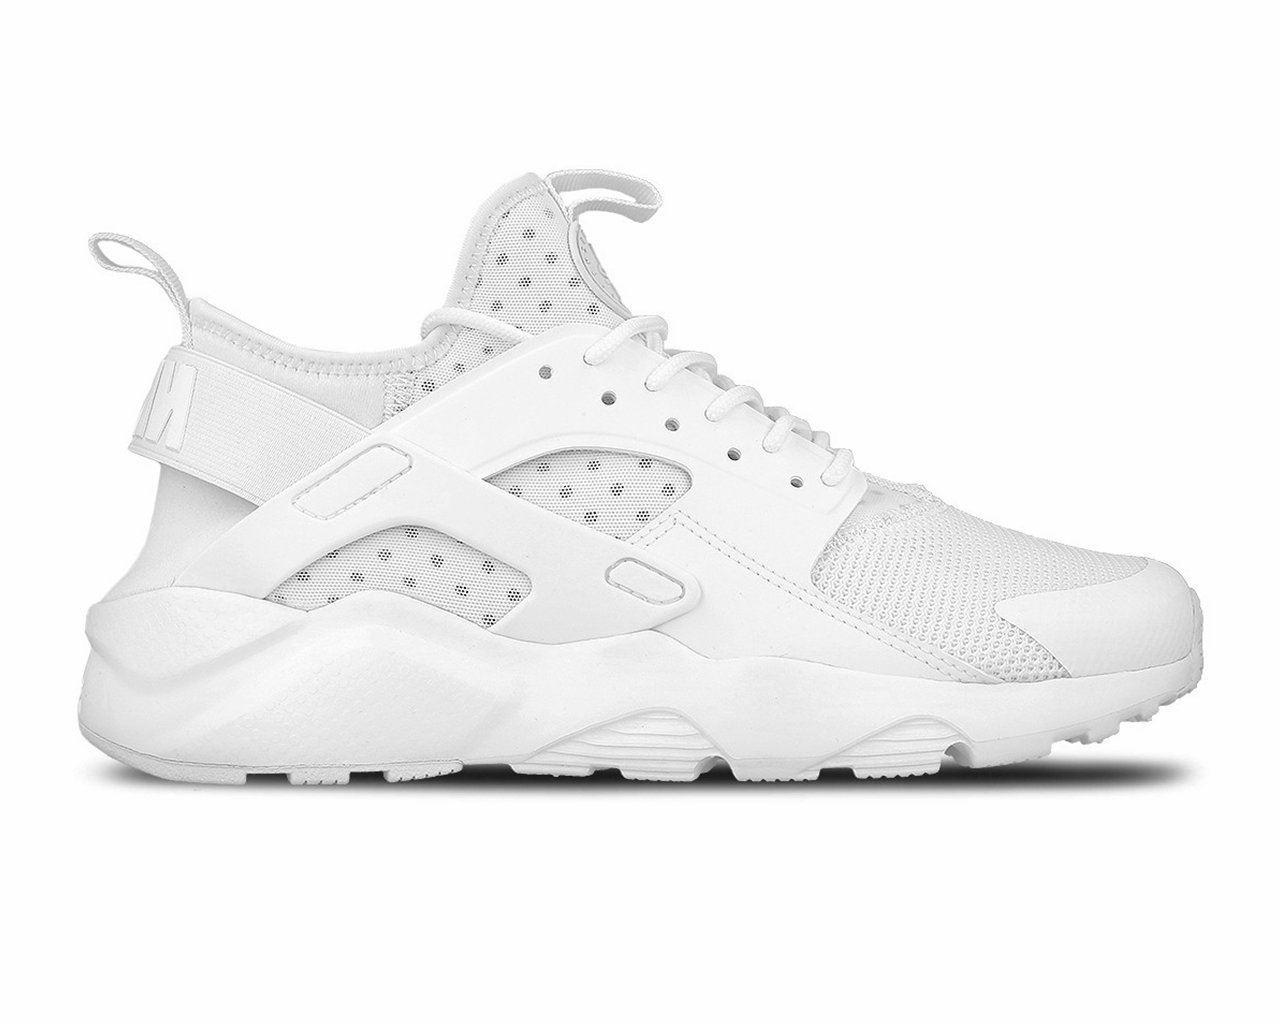 Sale Mens Nike Air Huarache Huarache Huarache Ultra 819685 101 Gym Trainers White 2f29e2